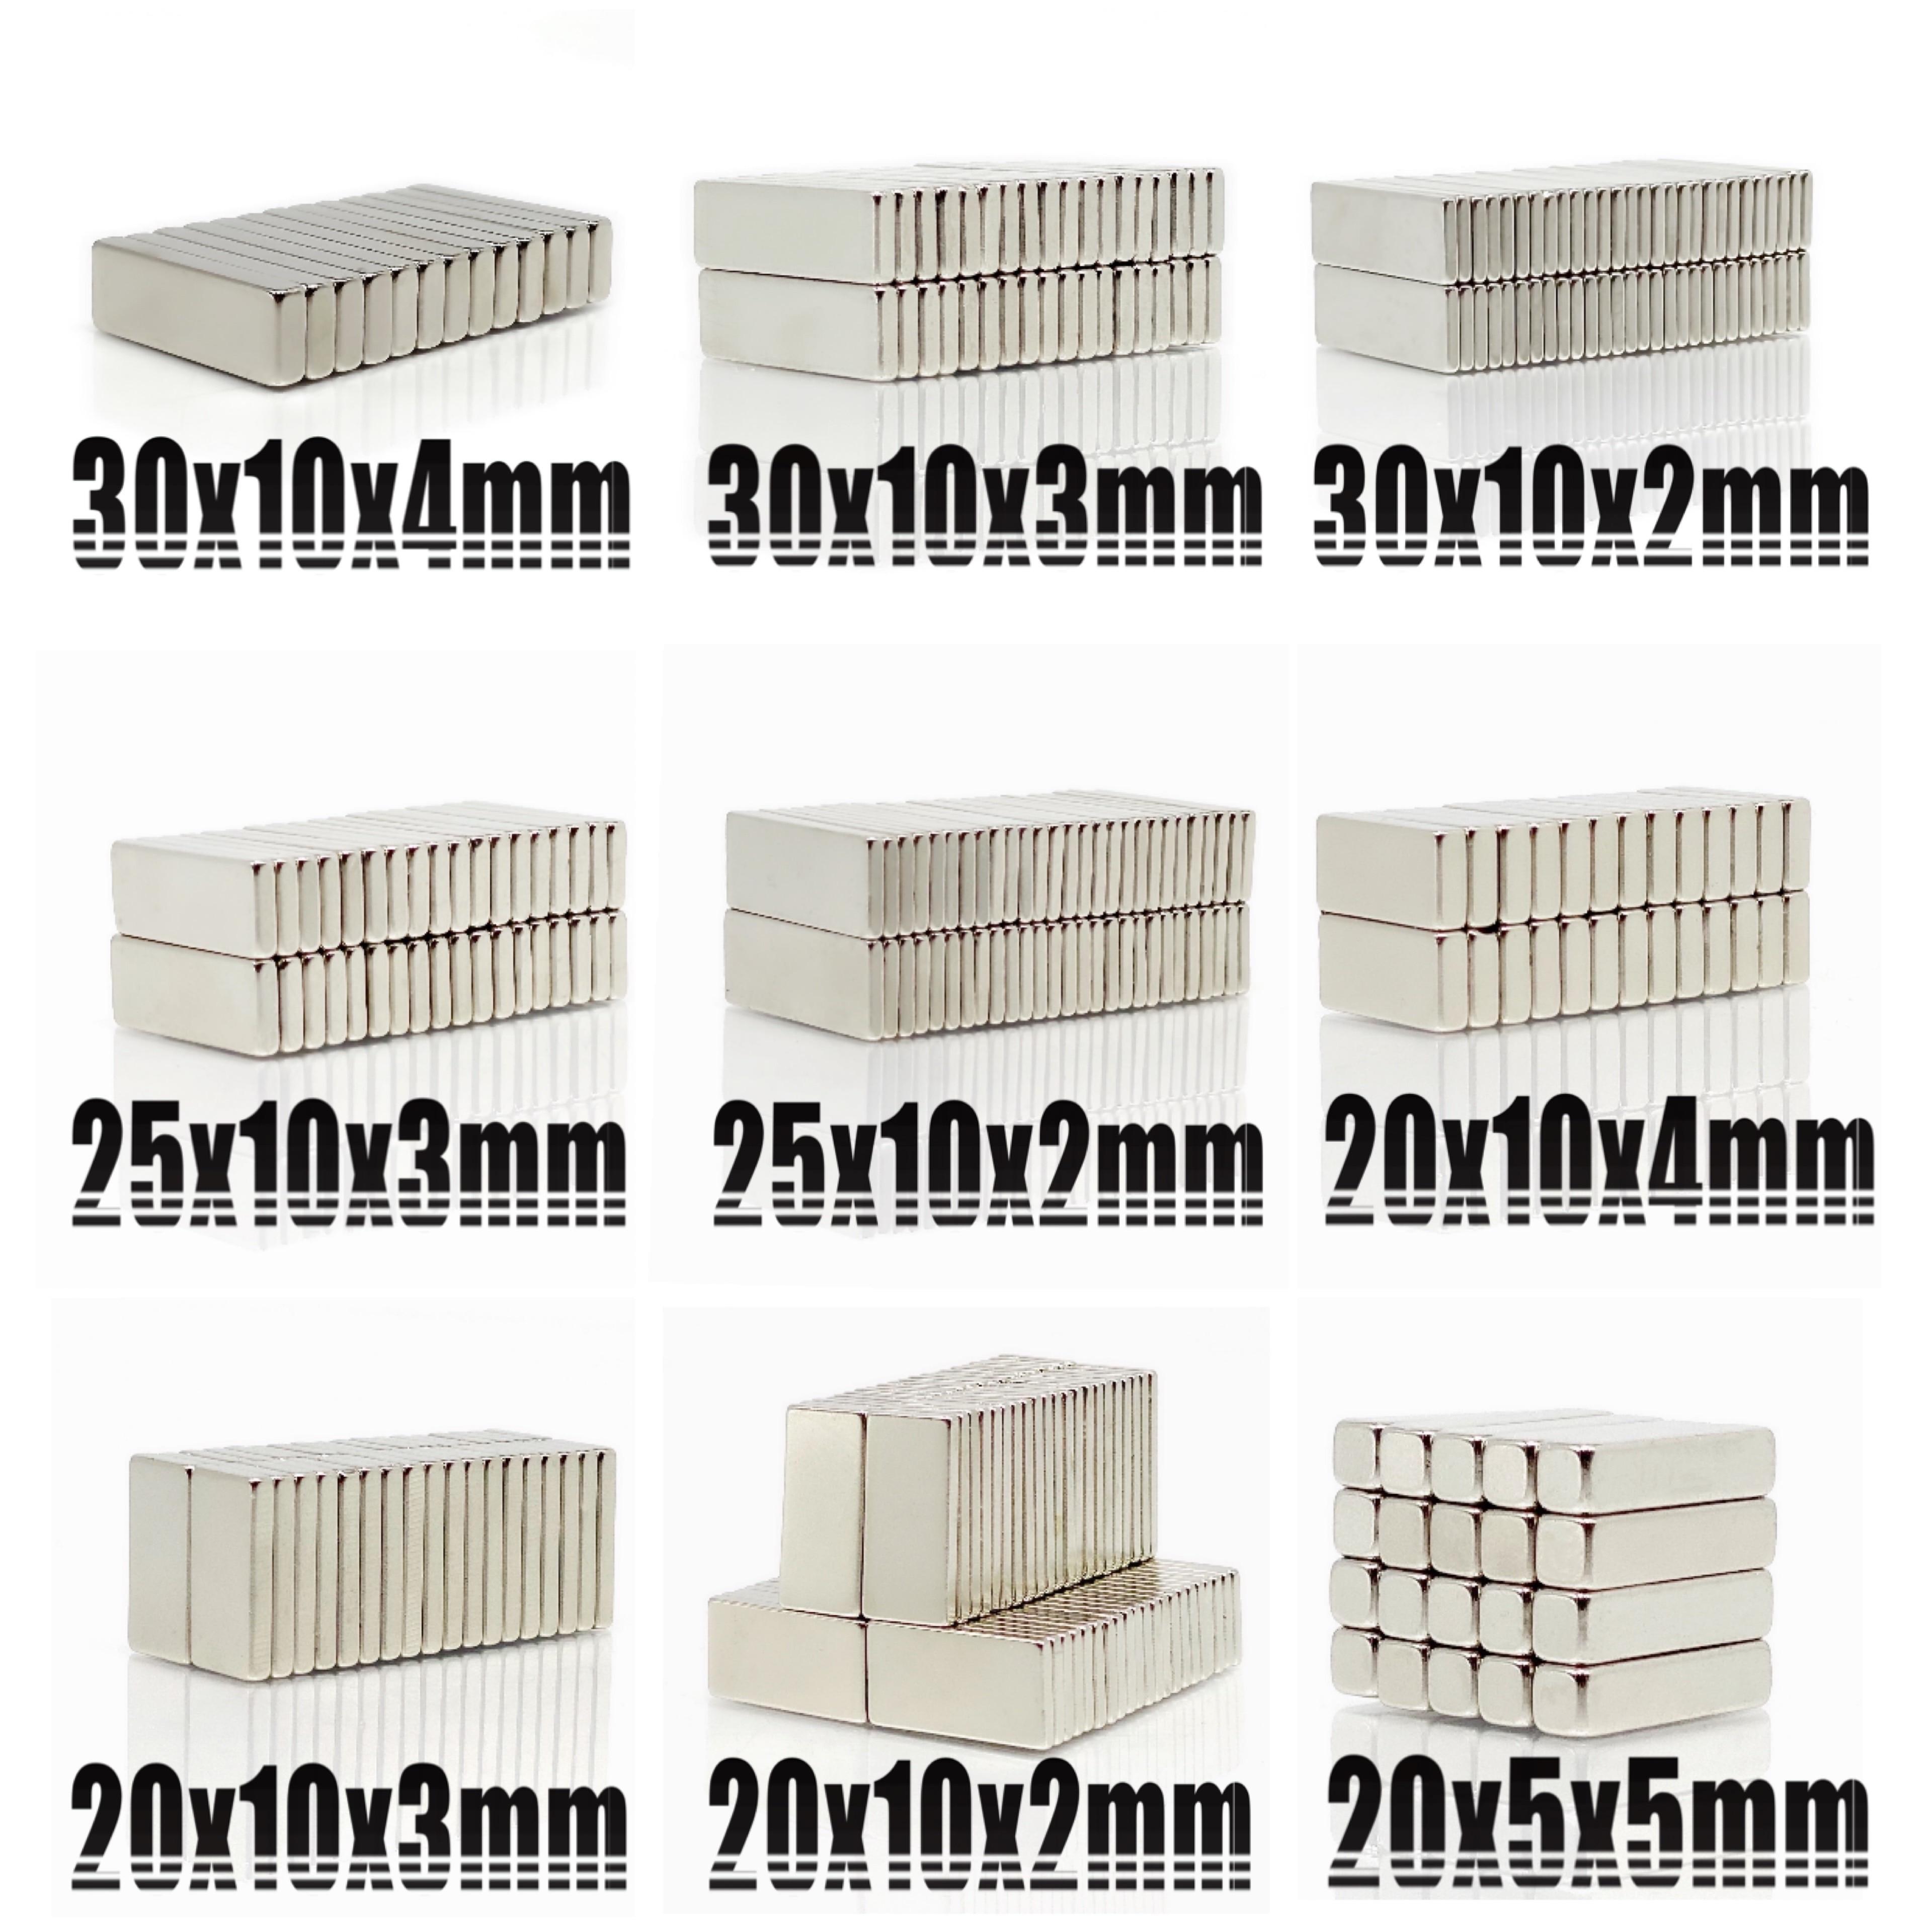 20 piezas N35 imán de neodimio bloque 20X10X2 20X10X3 20X10X4 20X10X5 25X10X3 30X10X2 30x10x4 20X5X2mm bloque Bar imanes raros de la tierra